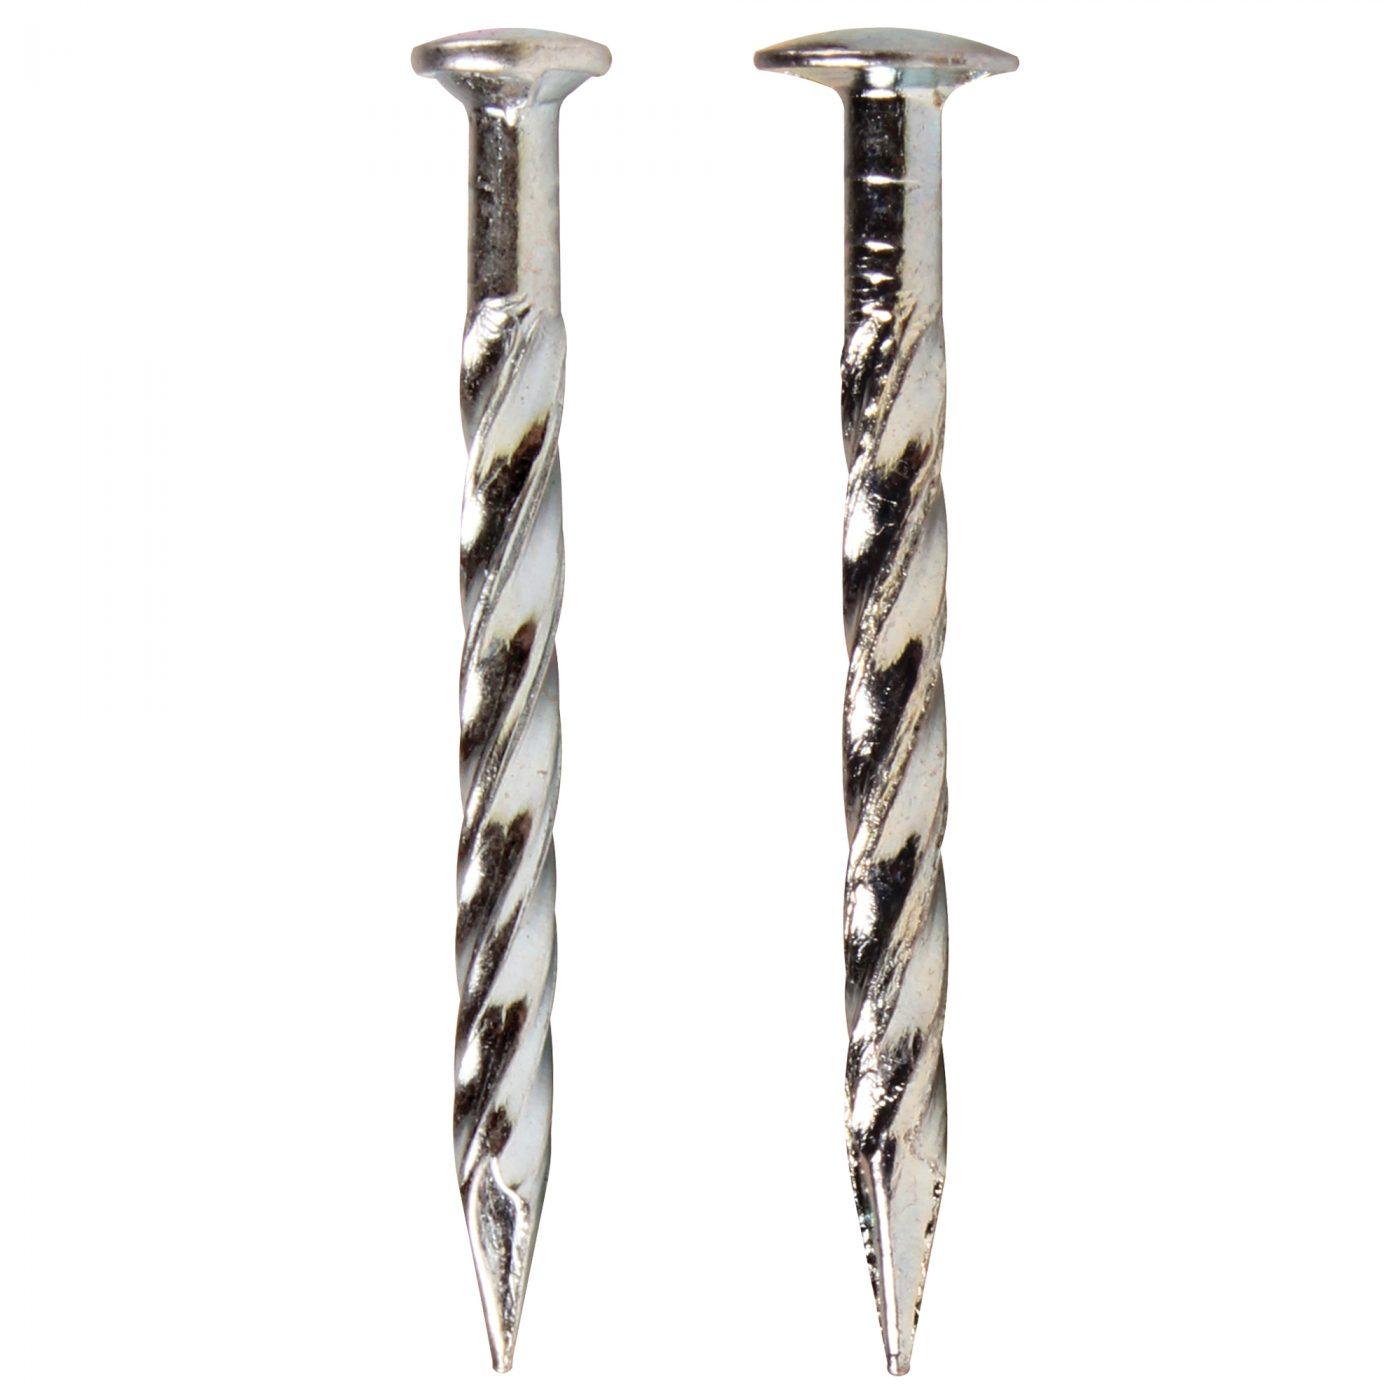 13 Gauge Drive Screw Nails Unichrome